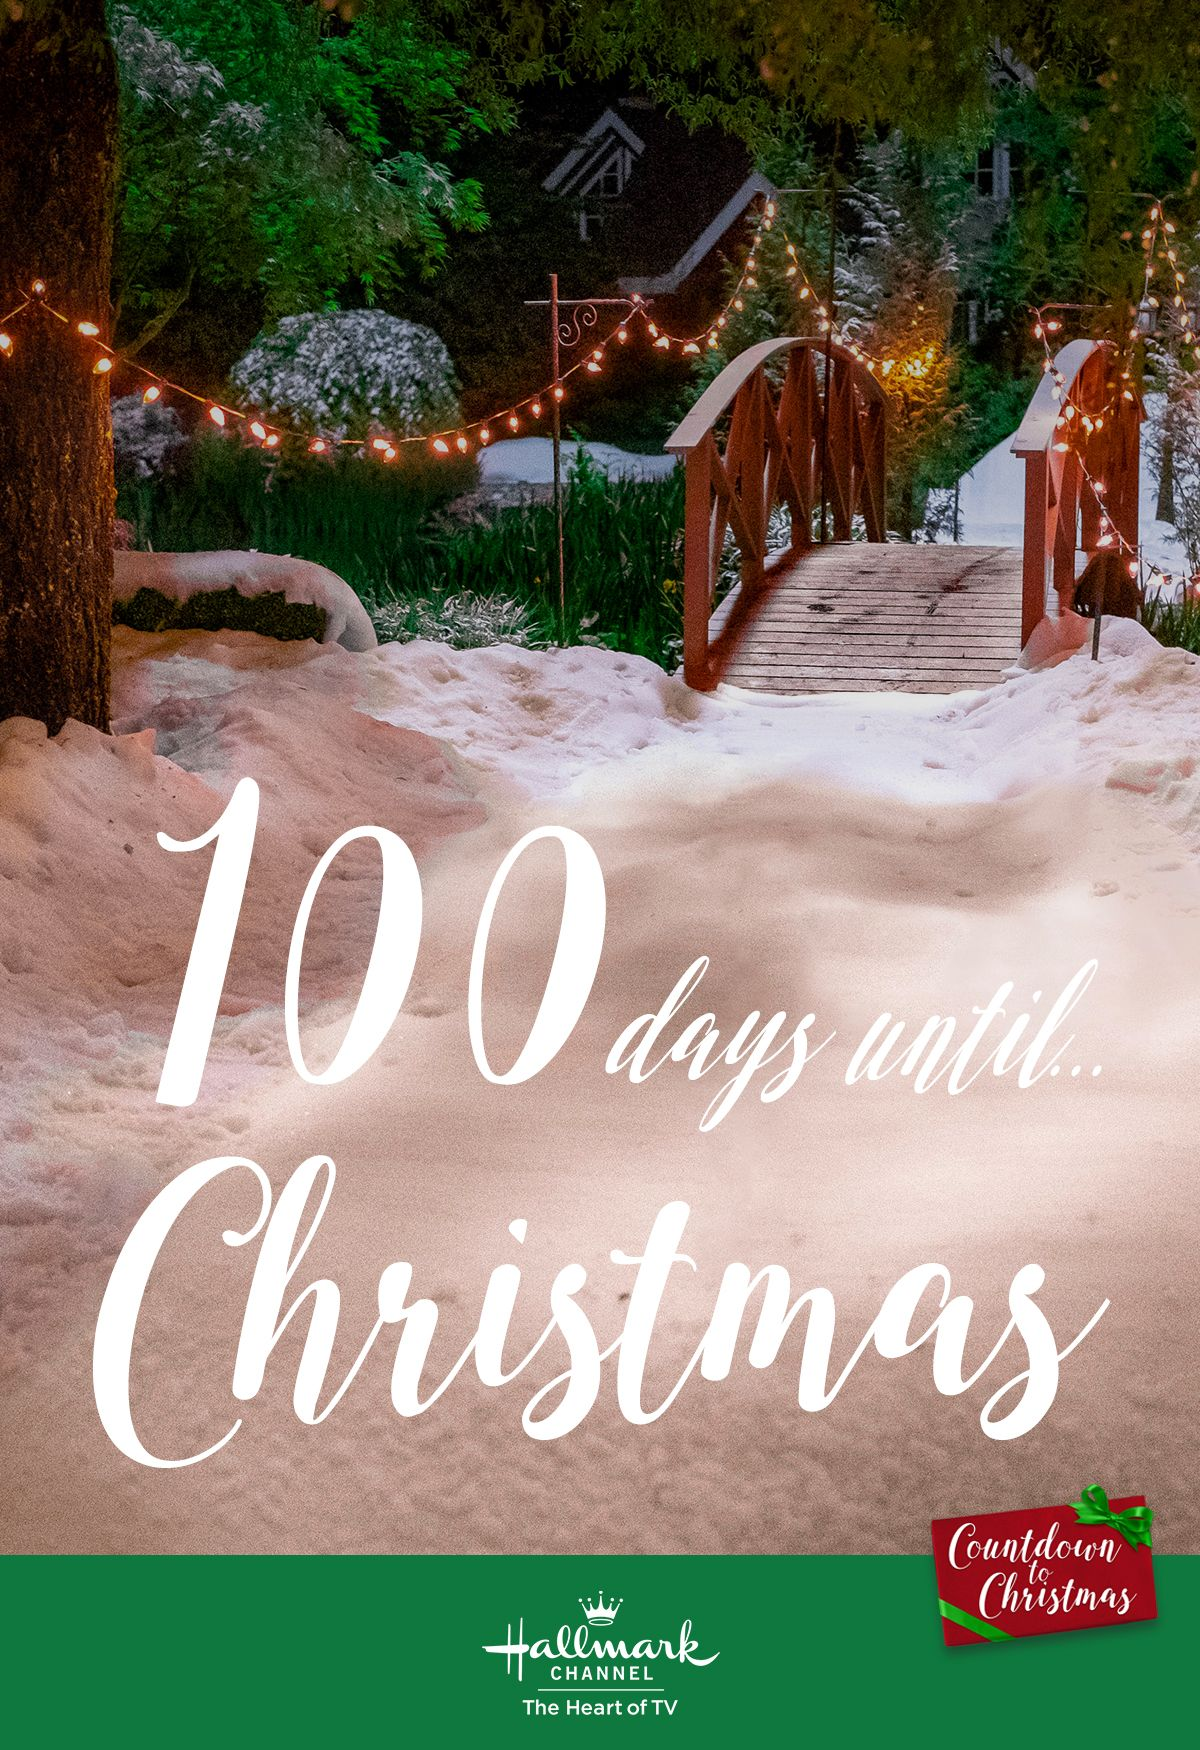 100 days til Christmas! Countdown to Christmas with 22 new